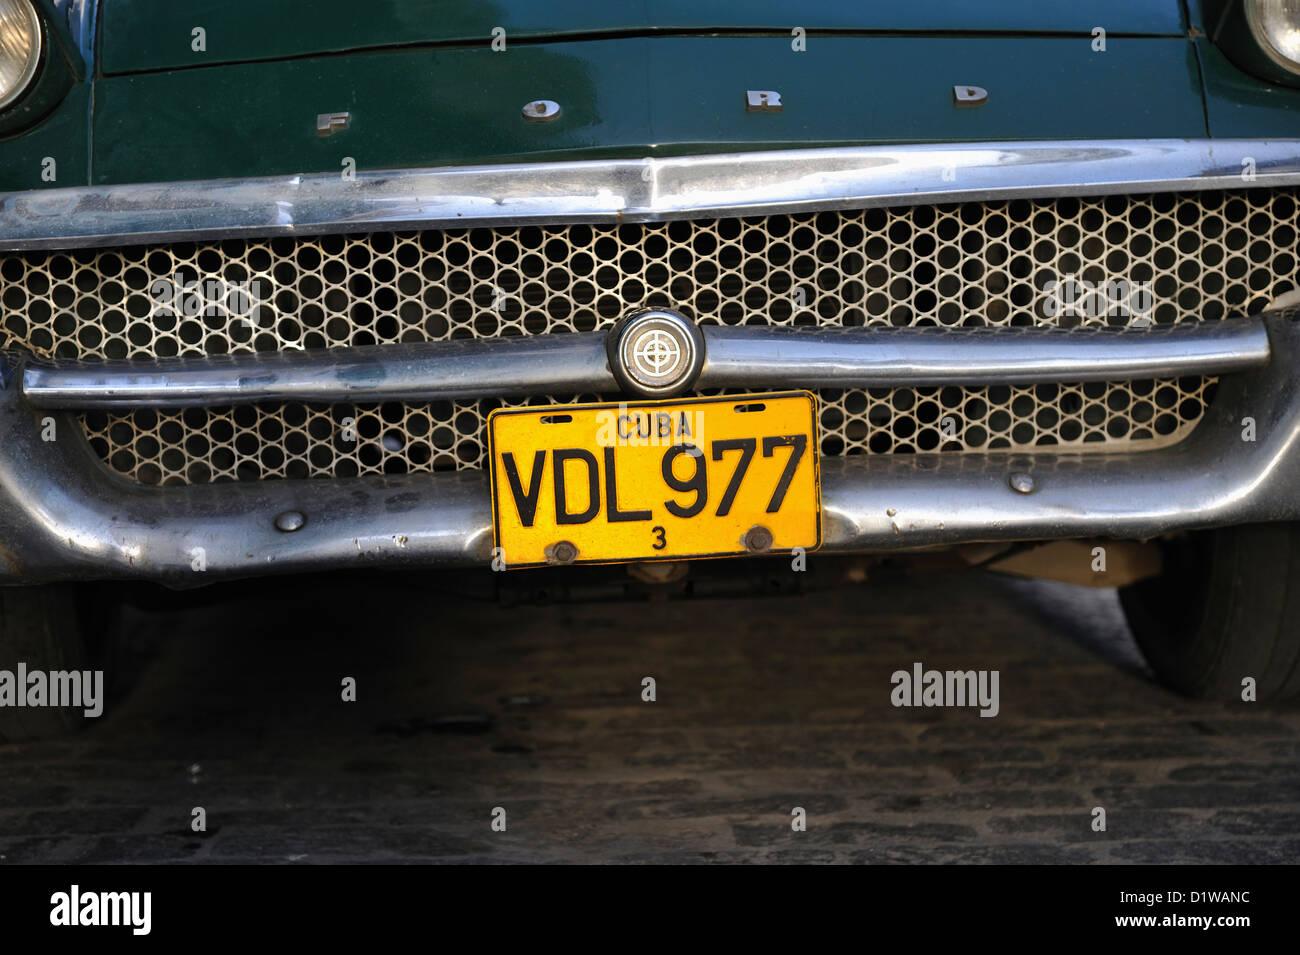 Old car, Santa Clara, Cuba Stock Photo, Royalty Free Image ...